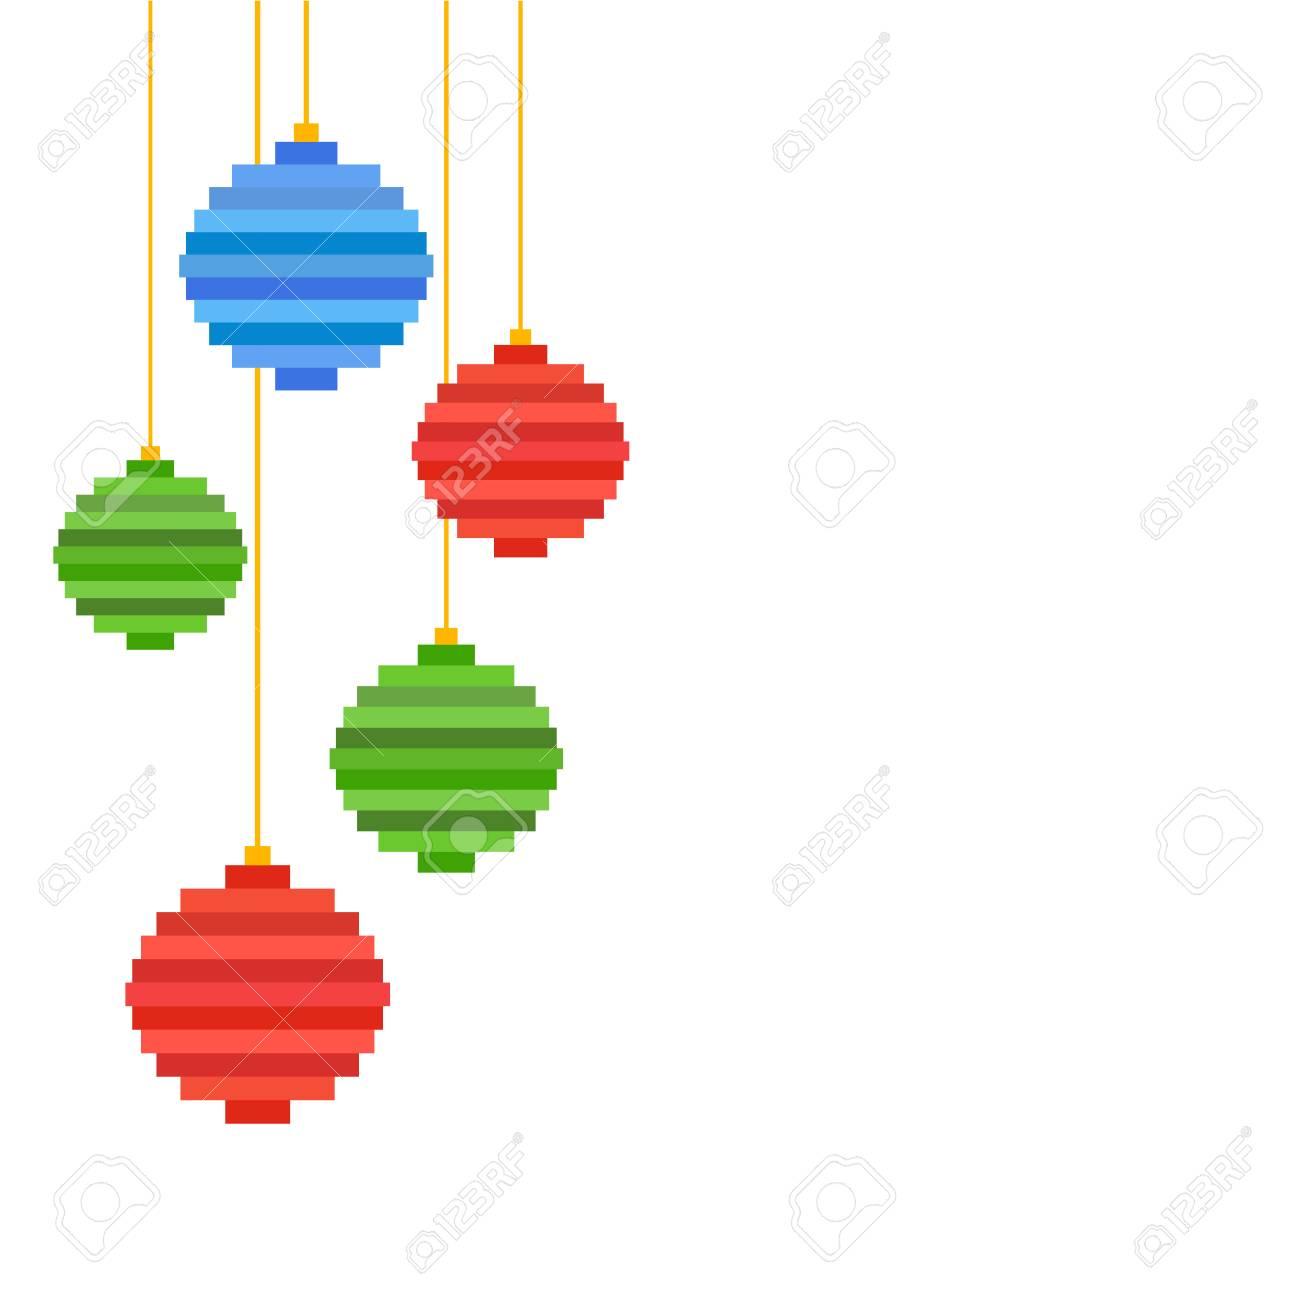 Vecteur Cinq Pixel Art Boule De Sapin De Noël Design Plat Fond De